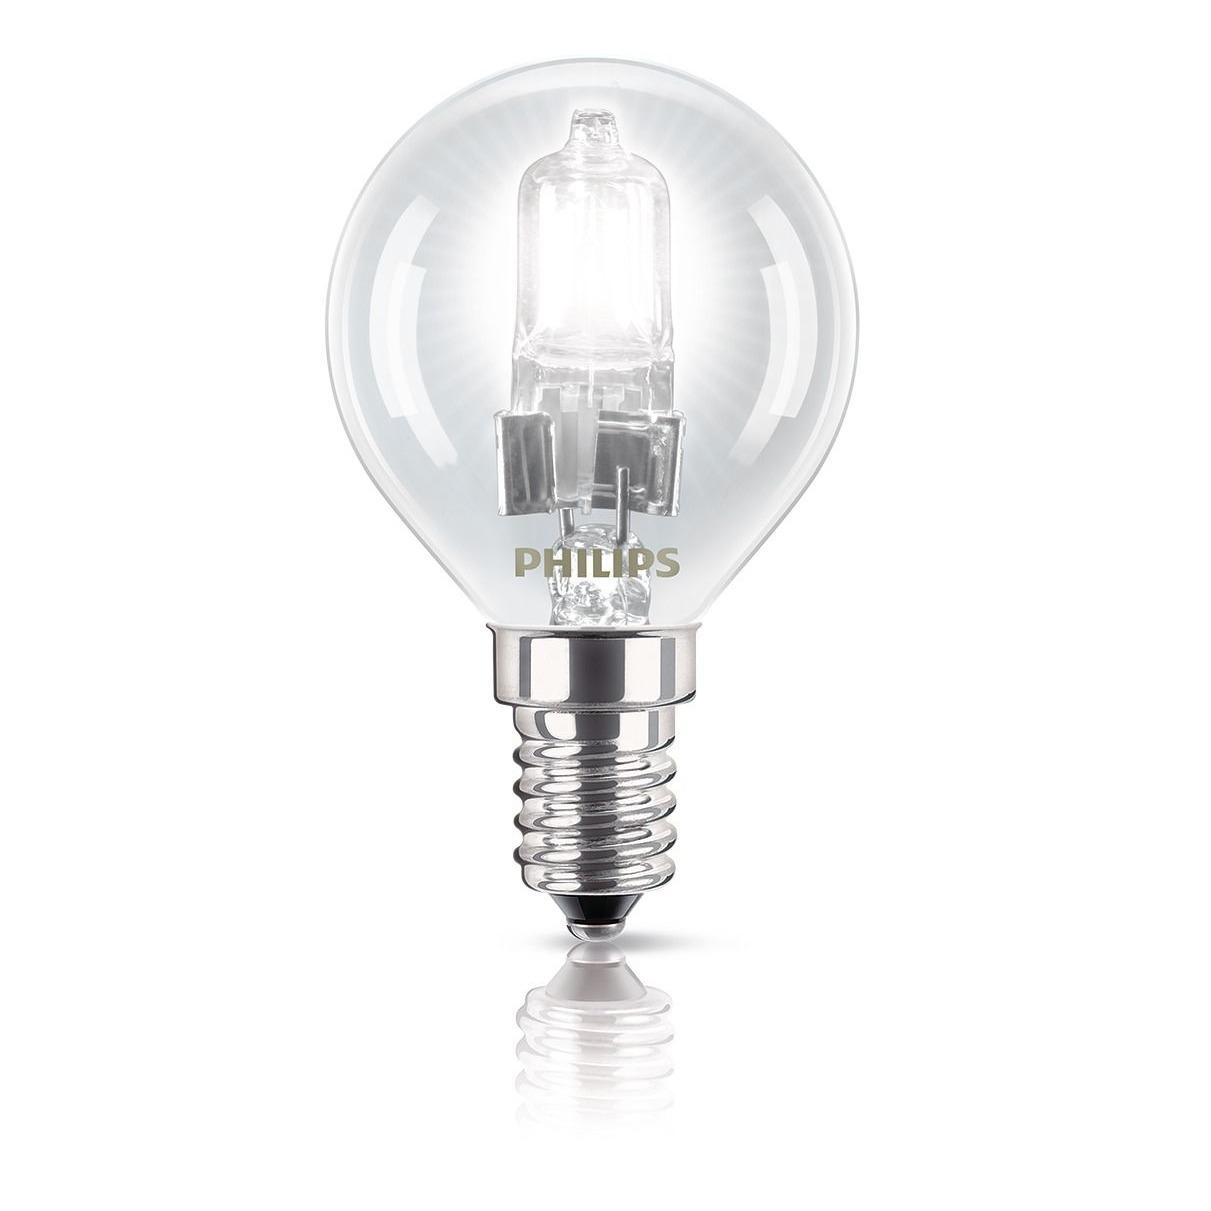 Philips halogeenlamp E14 28W 370Lm kogel